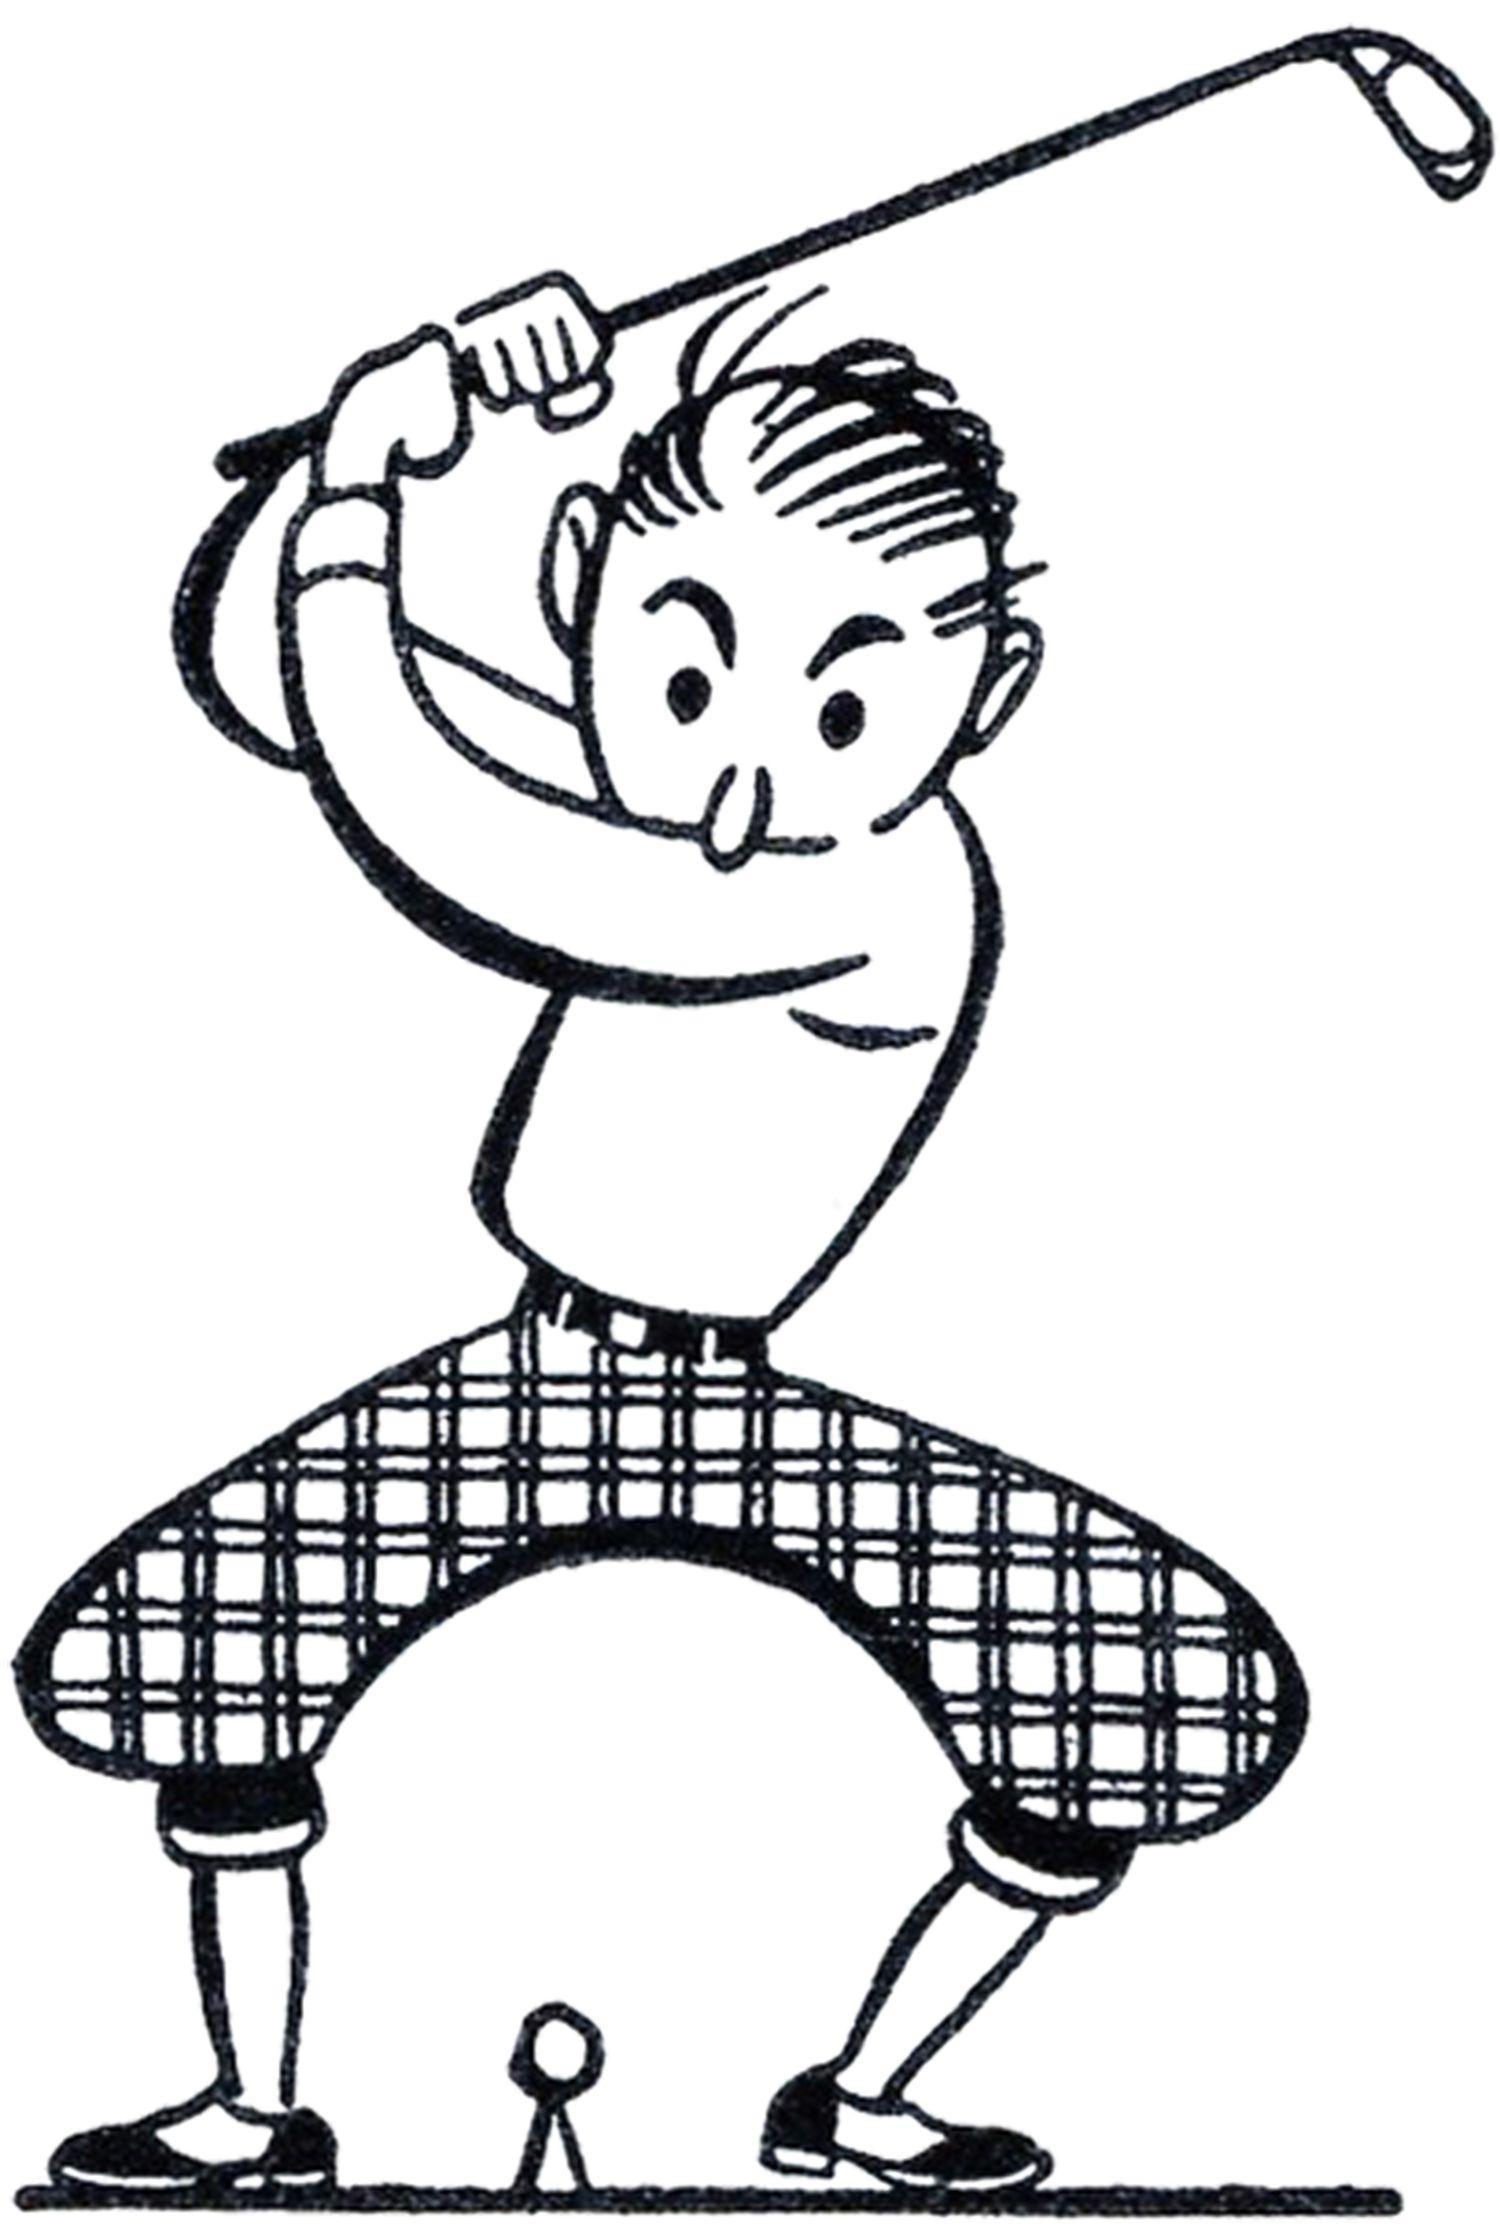 Retro Golf Clip Art.